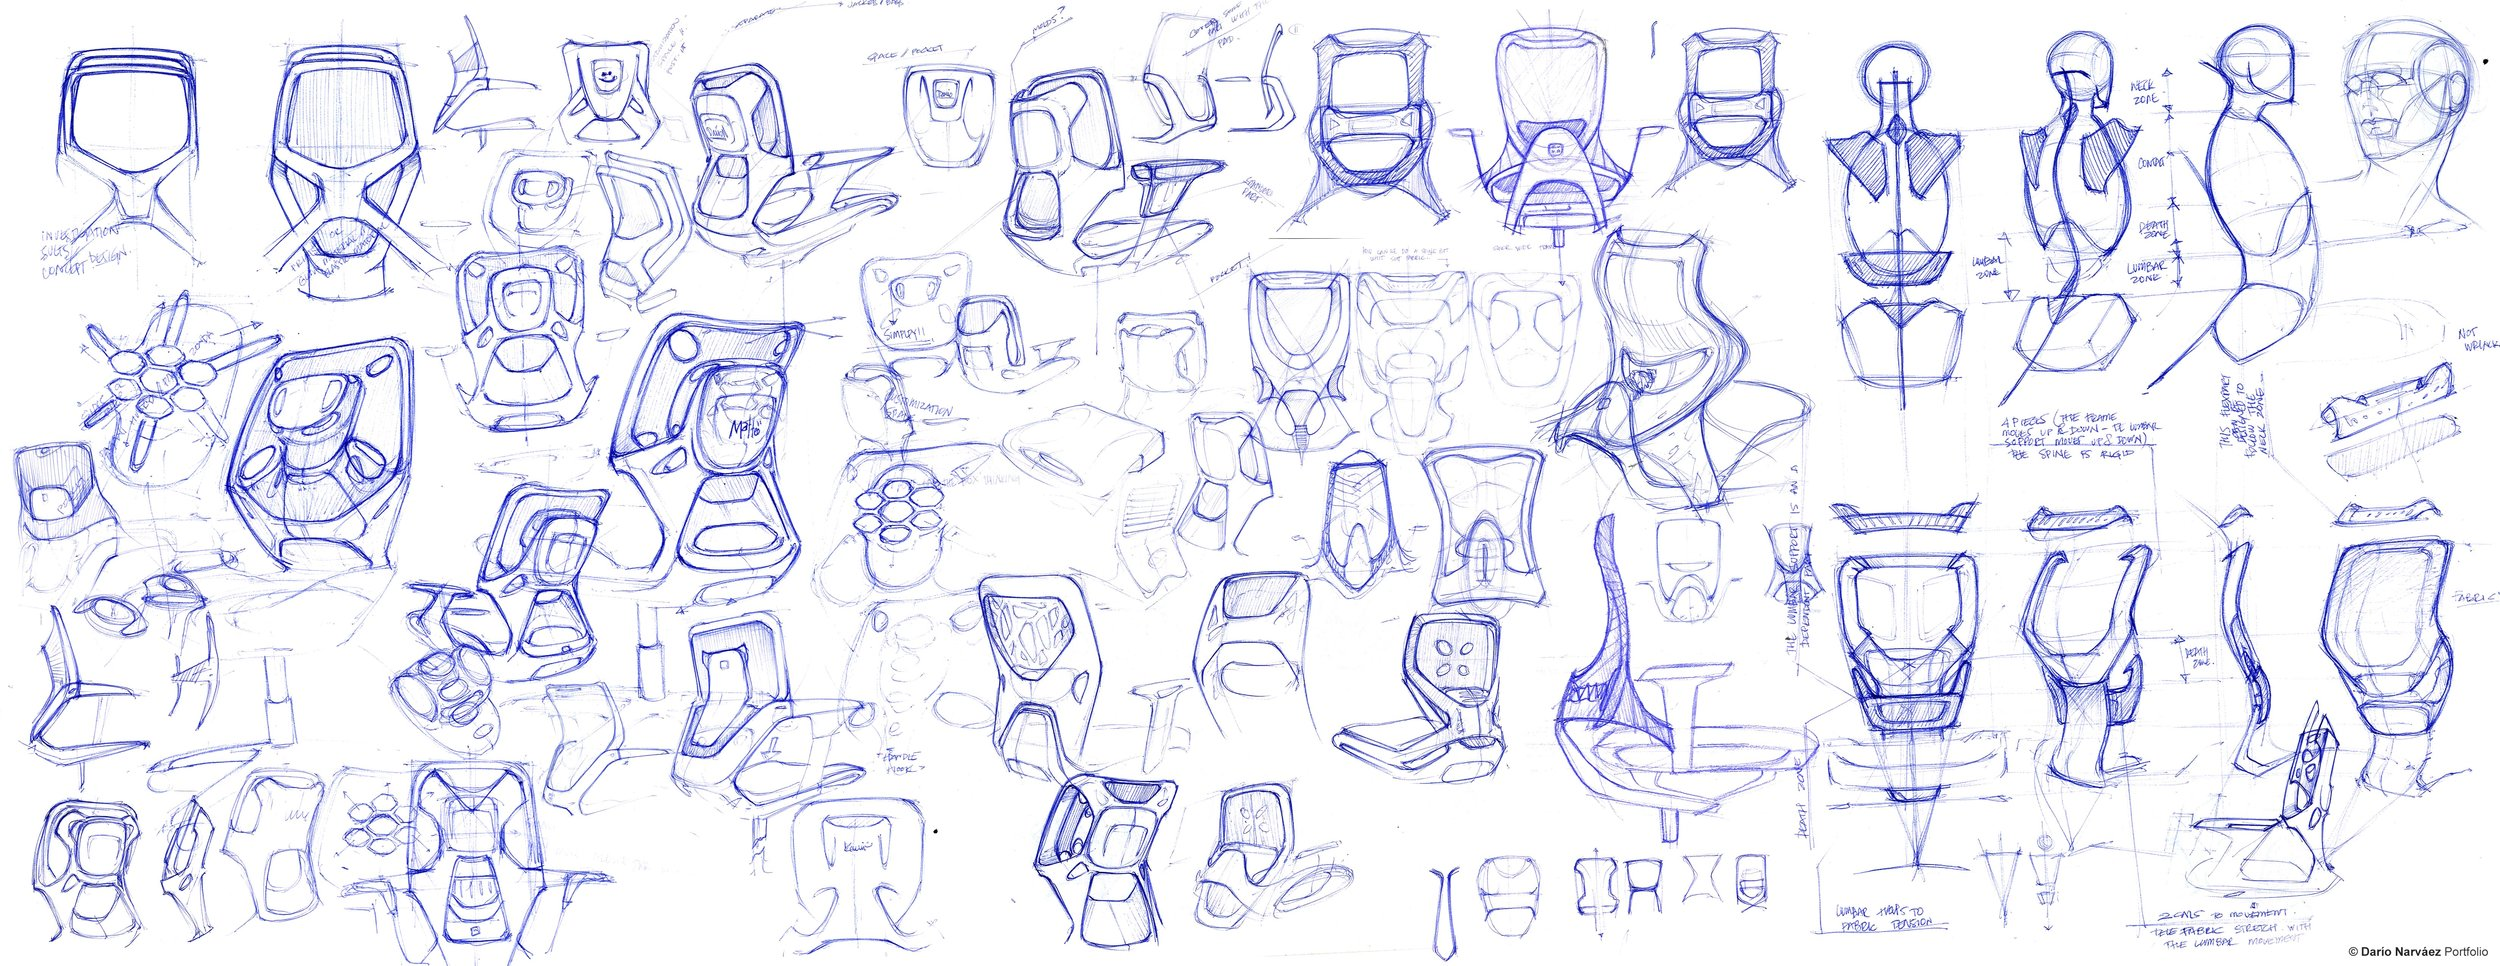 02F_DarioNarvaez_Portfolio_Ingo_Chair_Concept_Development_WEB-1.jpg